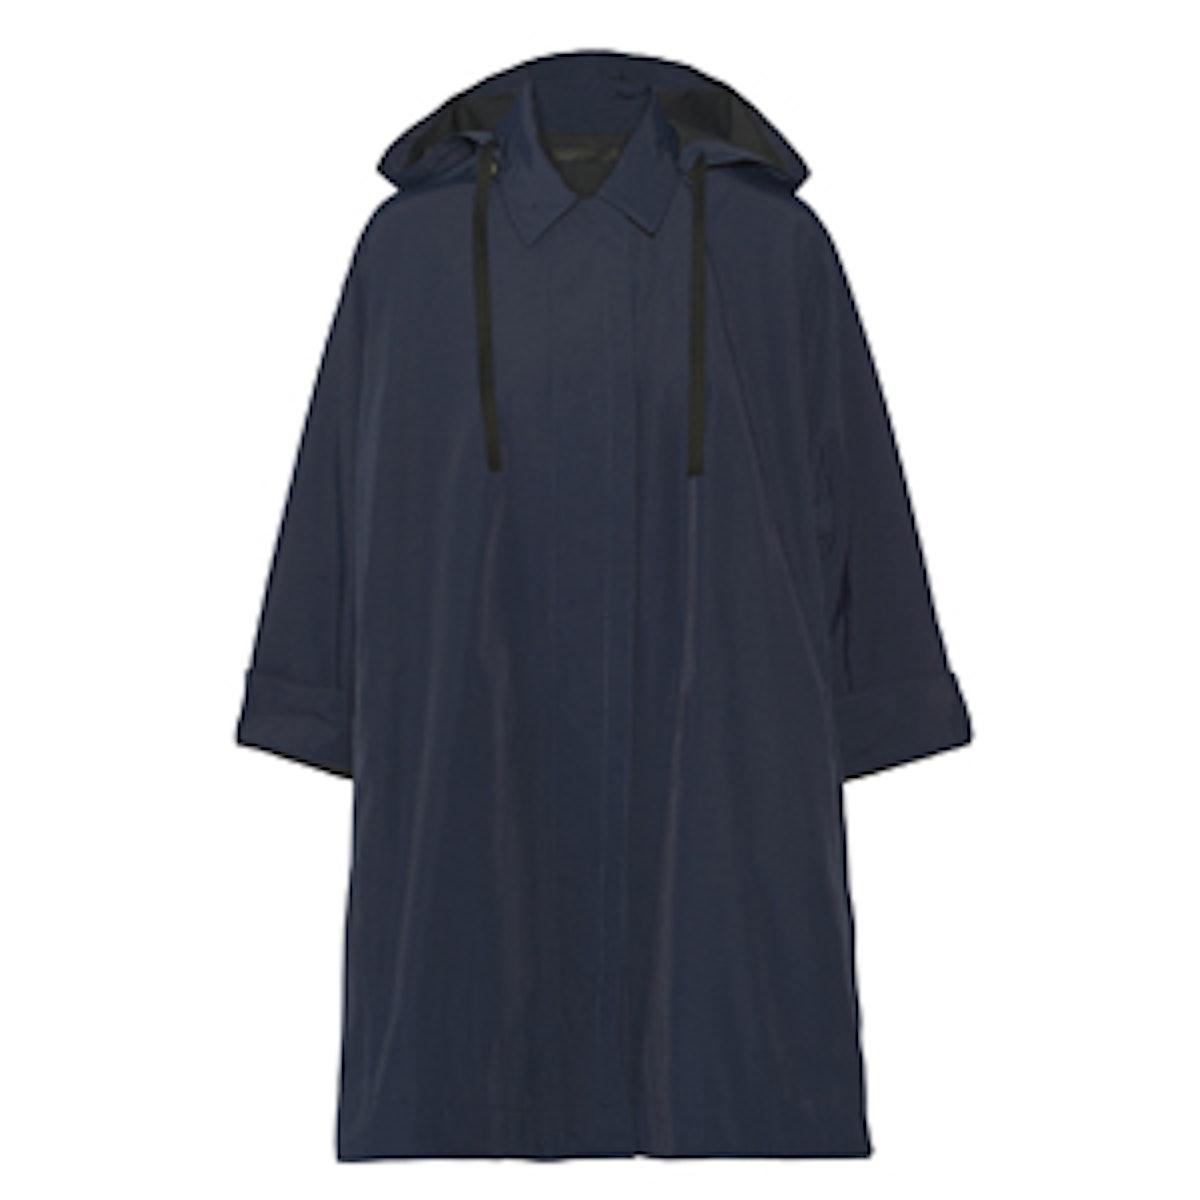 Rugan Oversized Coated Faille Hooded Coat